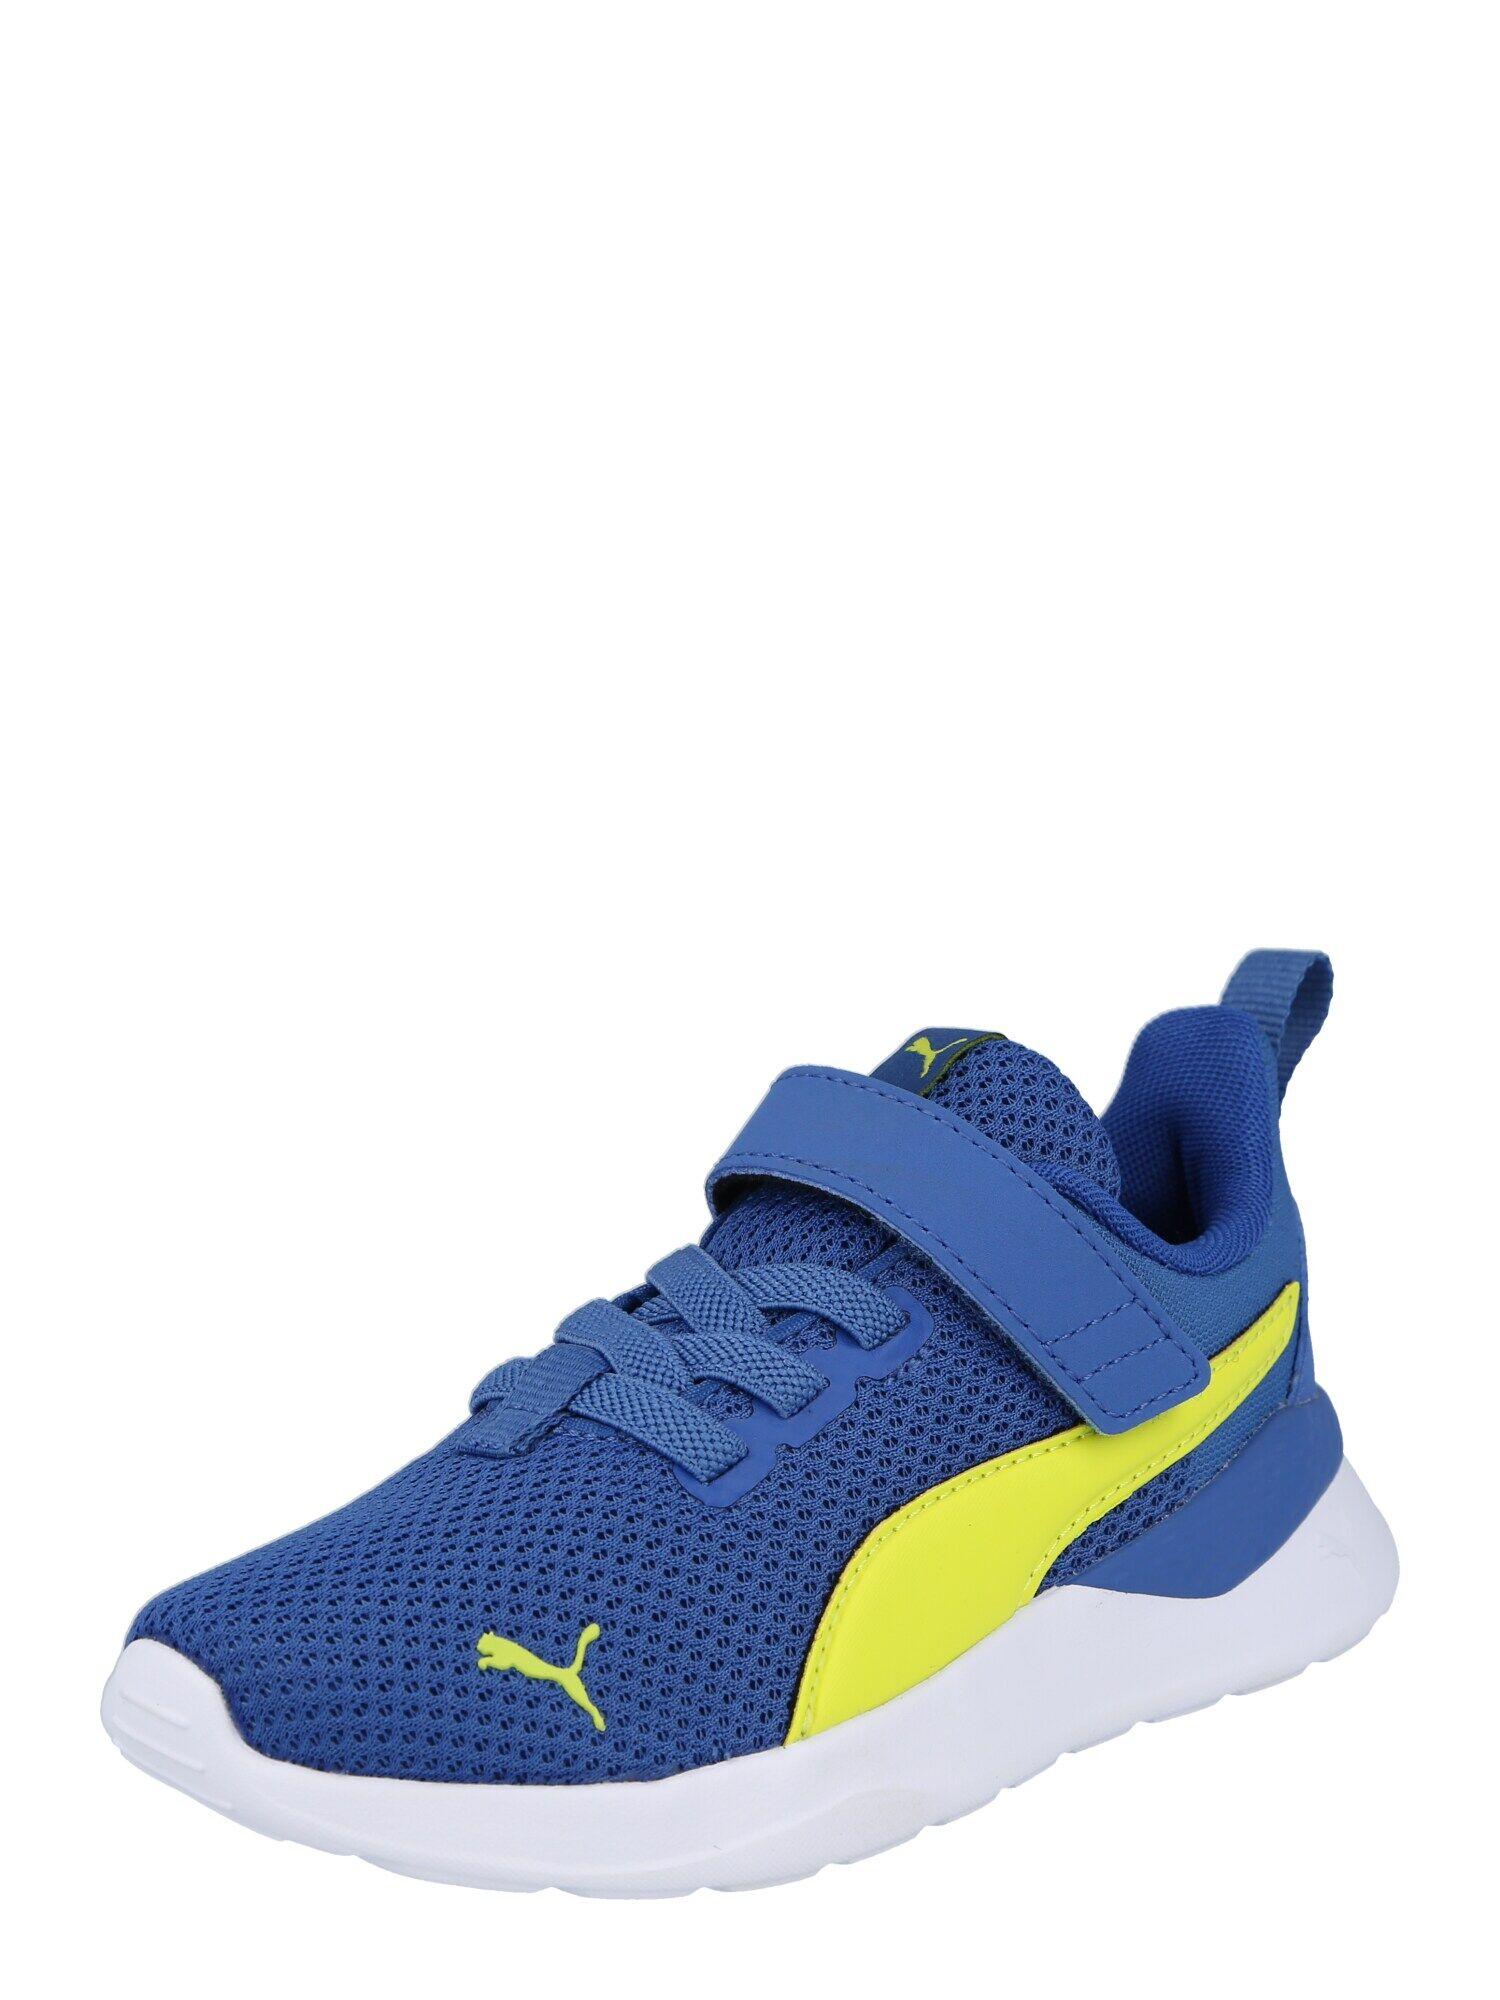 PUMA Baskets 'Anzarun Lite'  - Bleu - Taille: 1 - boy